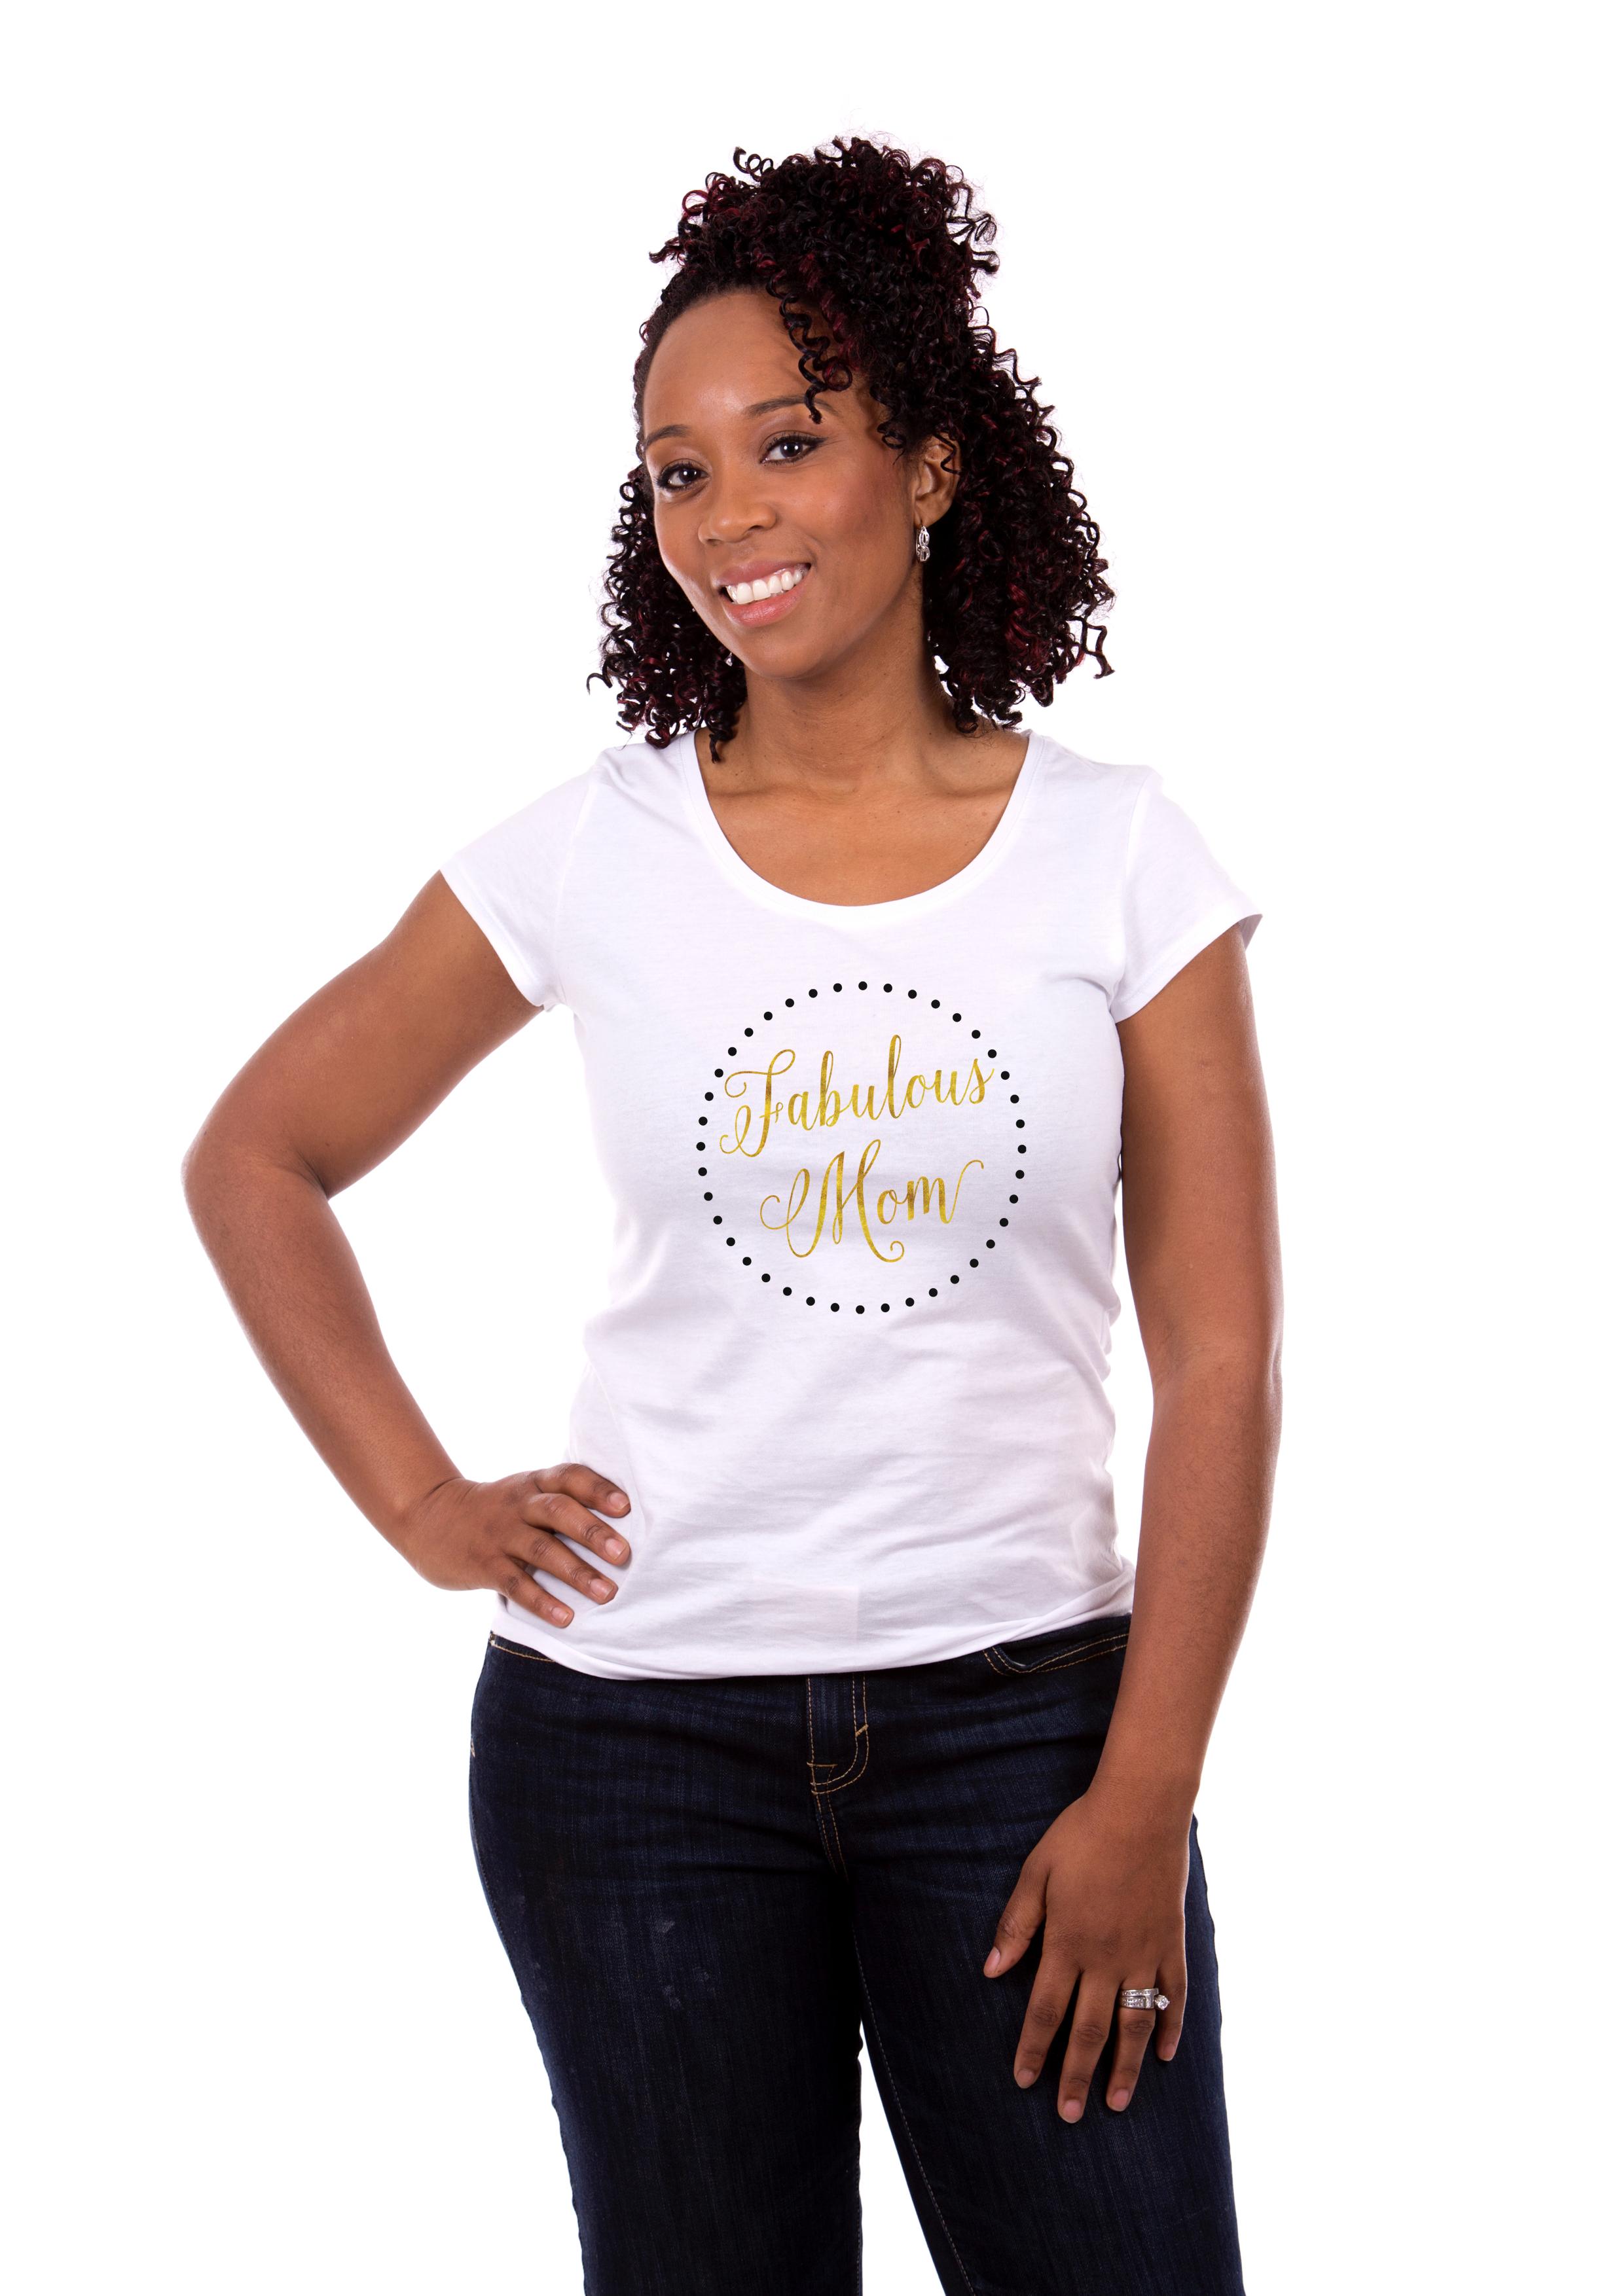 Fabulous Mom T Shirt White